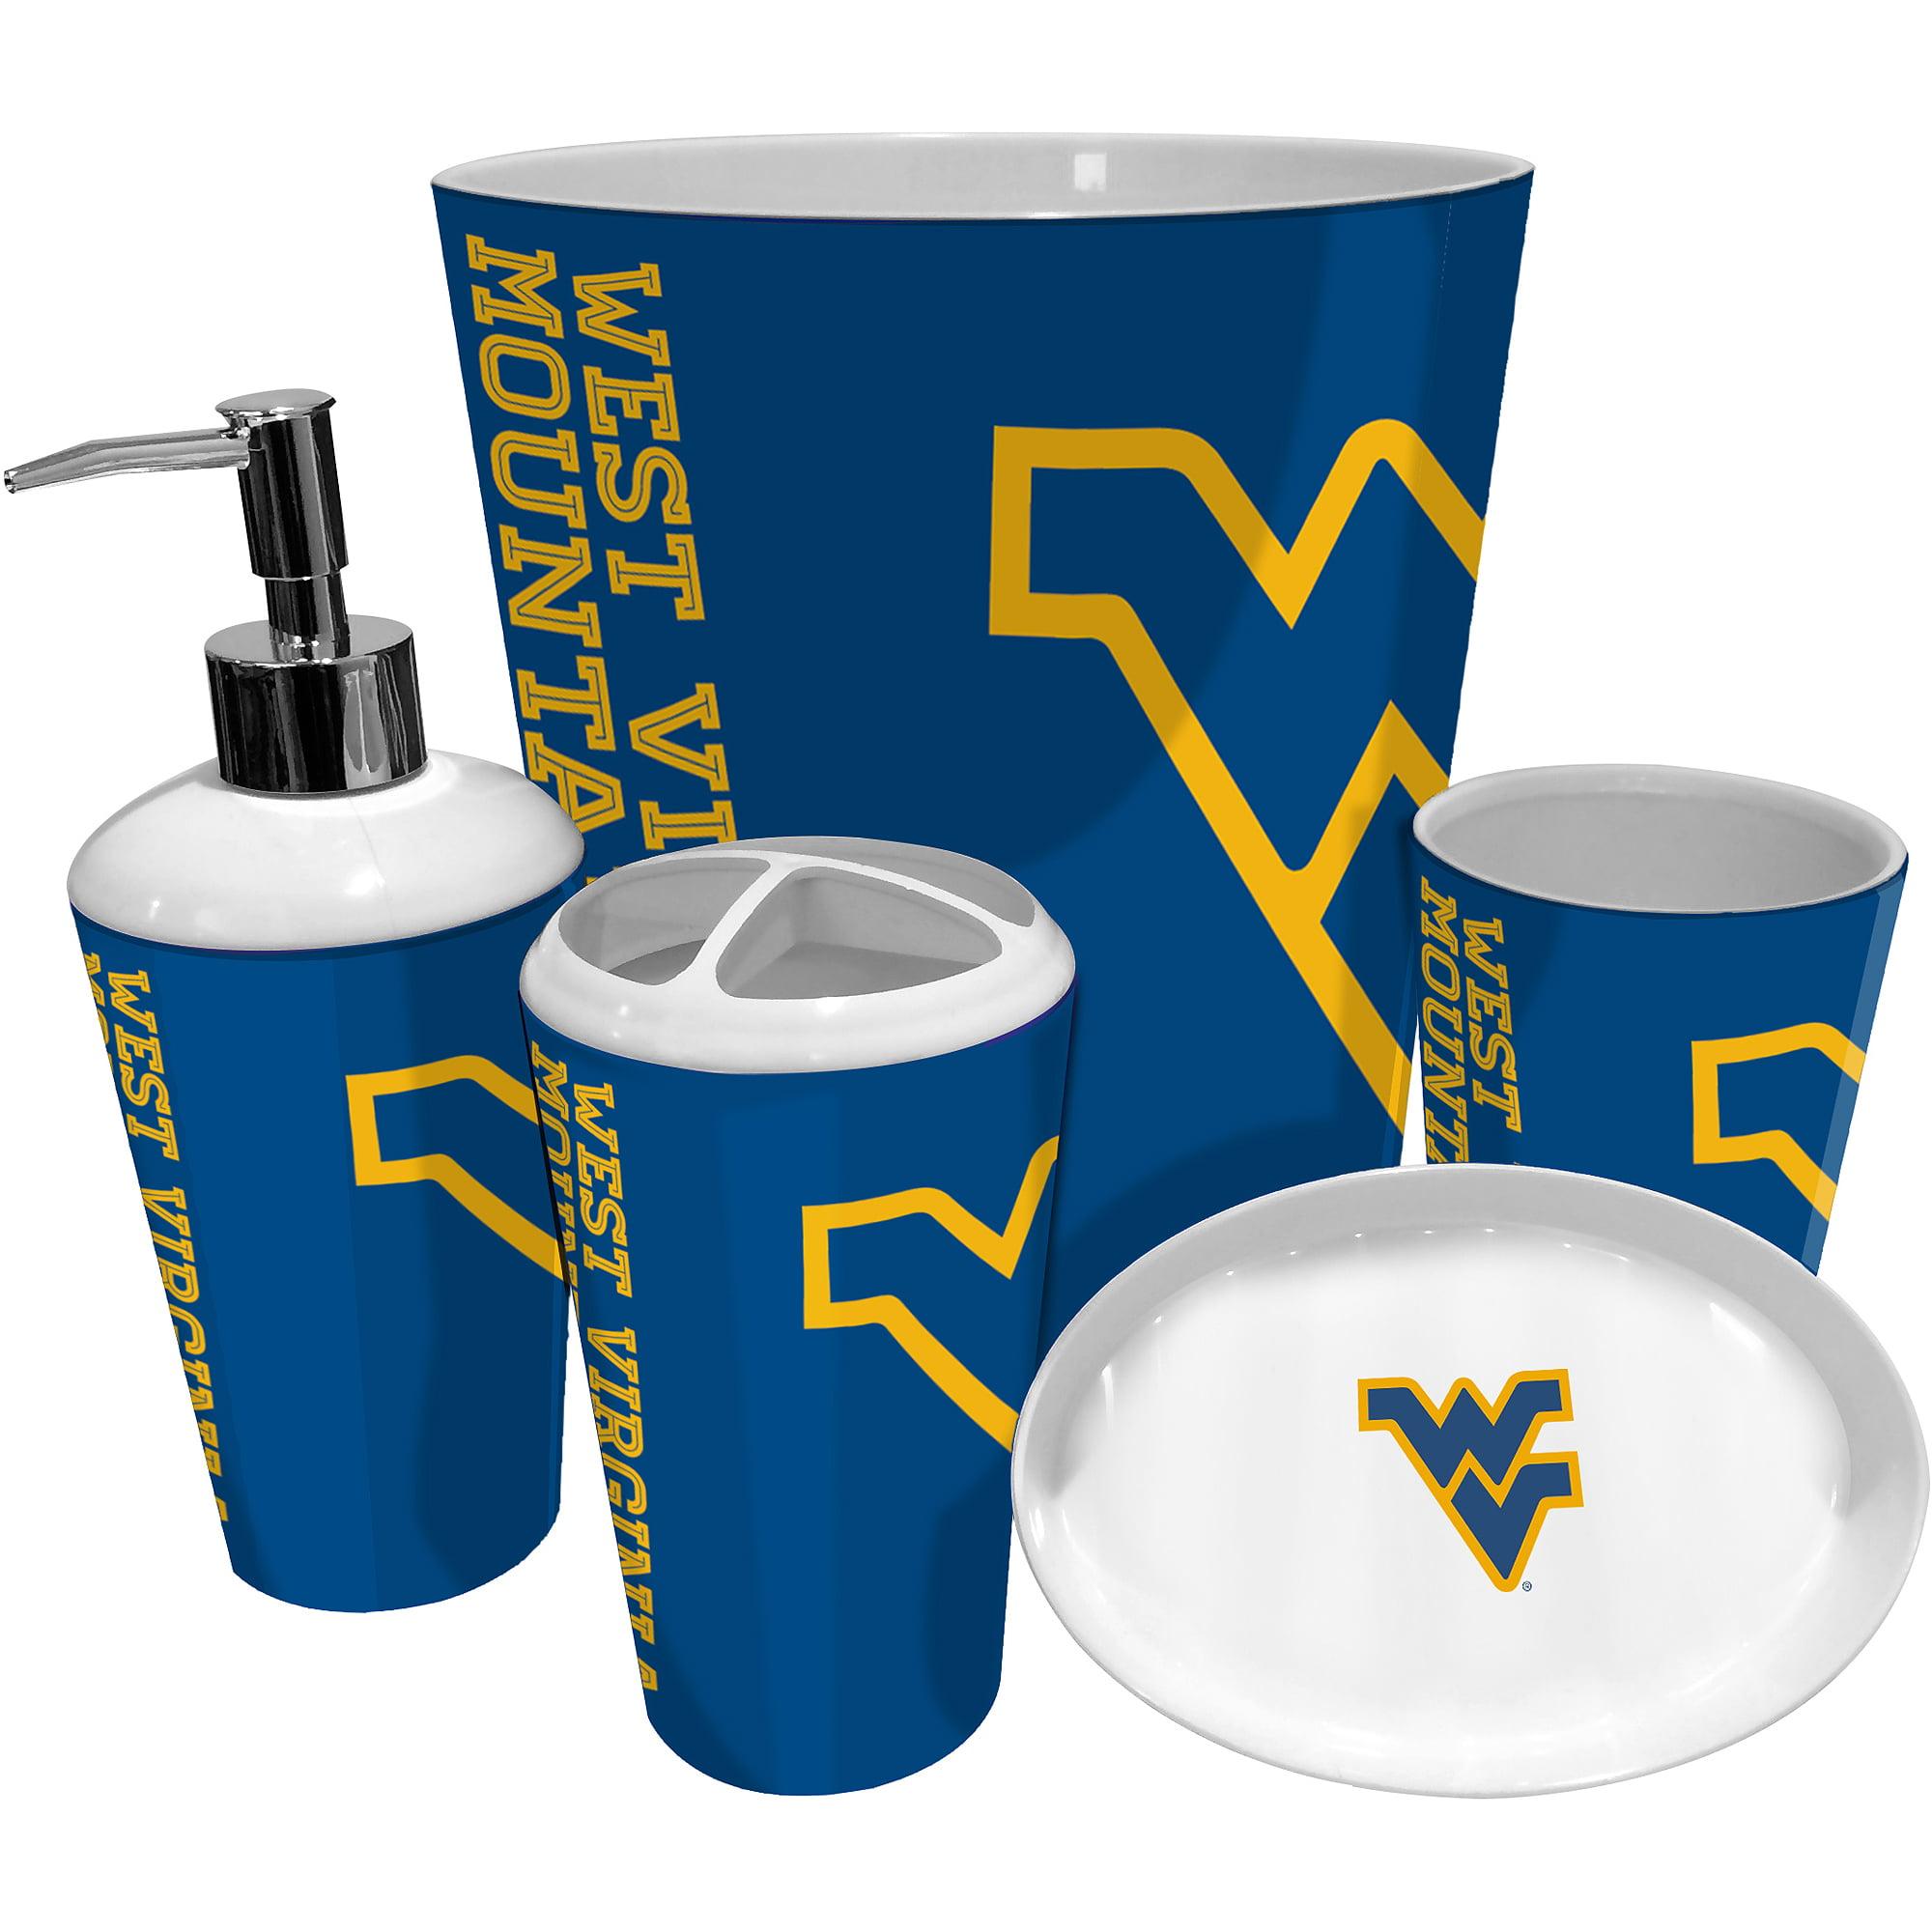 NCAA University of West Virginia Decorative Bath Collection - Bath Towel